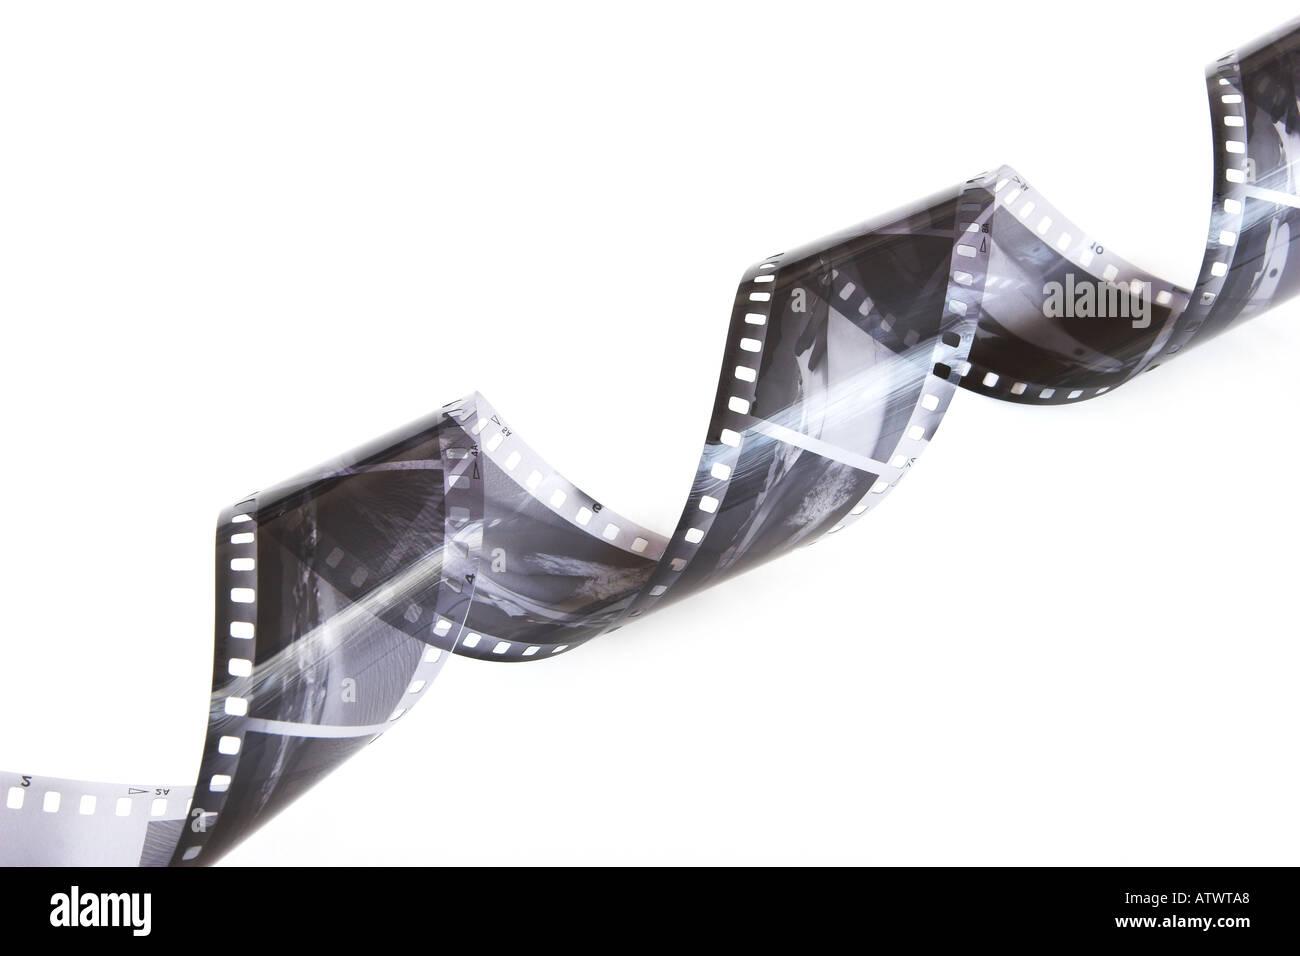 Arricciata in bianco e nero di negativi Immagini Stock